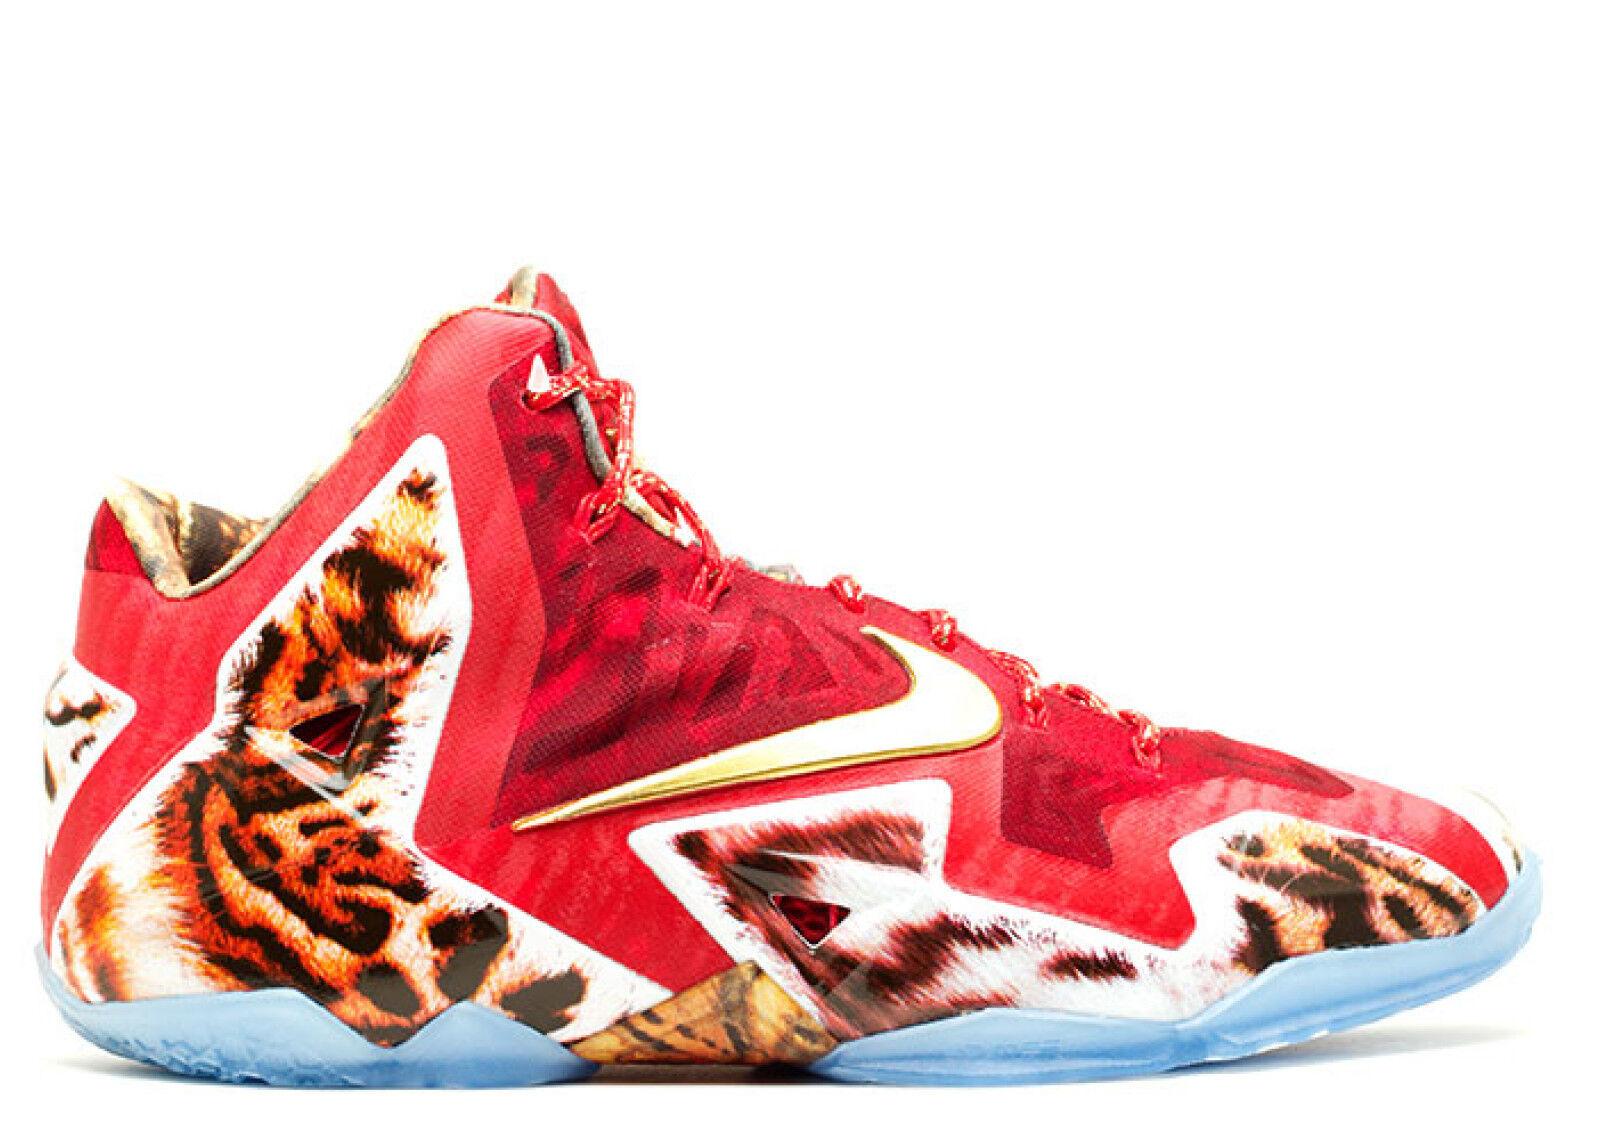 Nike LeBron 11 XI PRM 2K14 Size 13. 650884-674 Kyrie what the cavs mvp